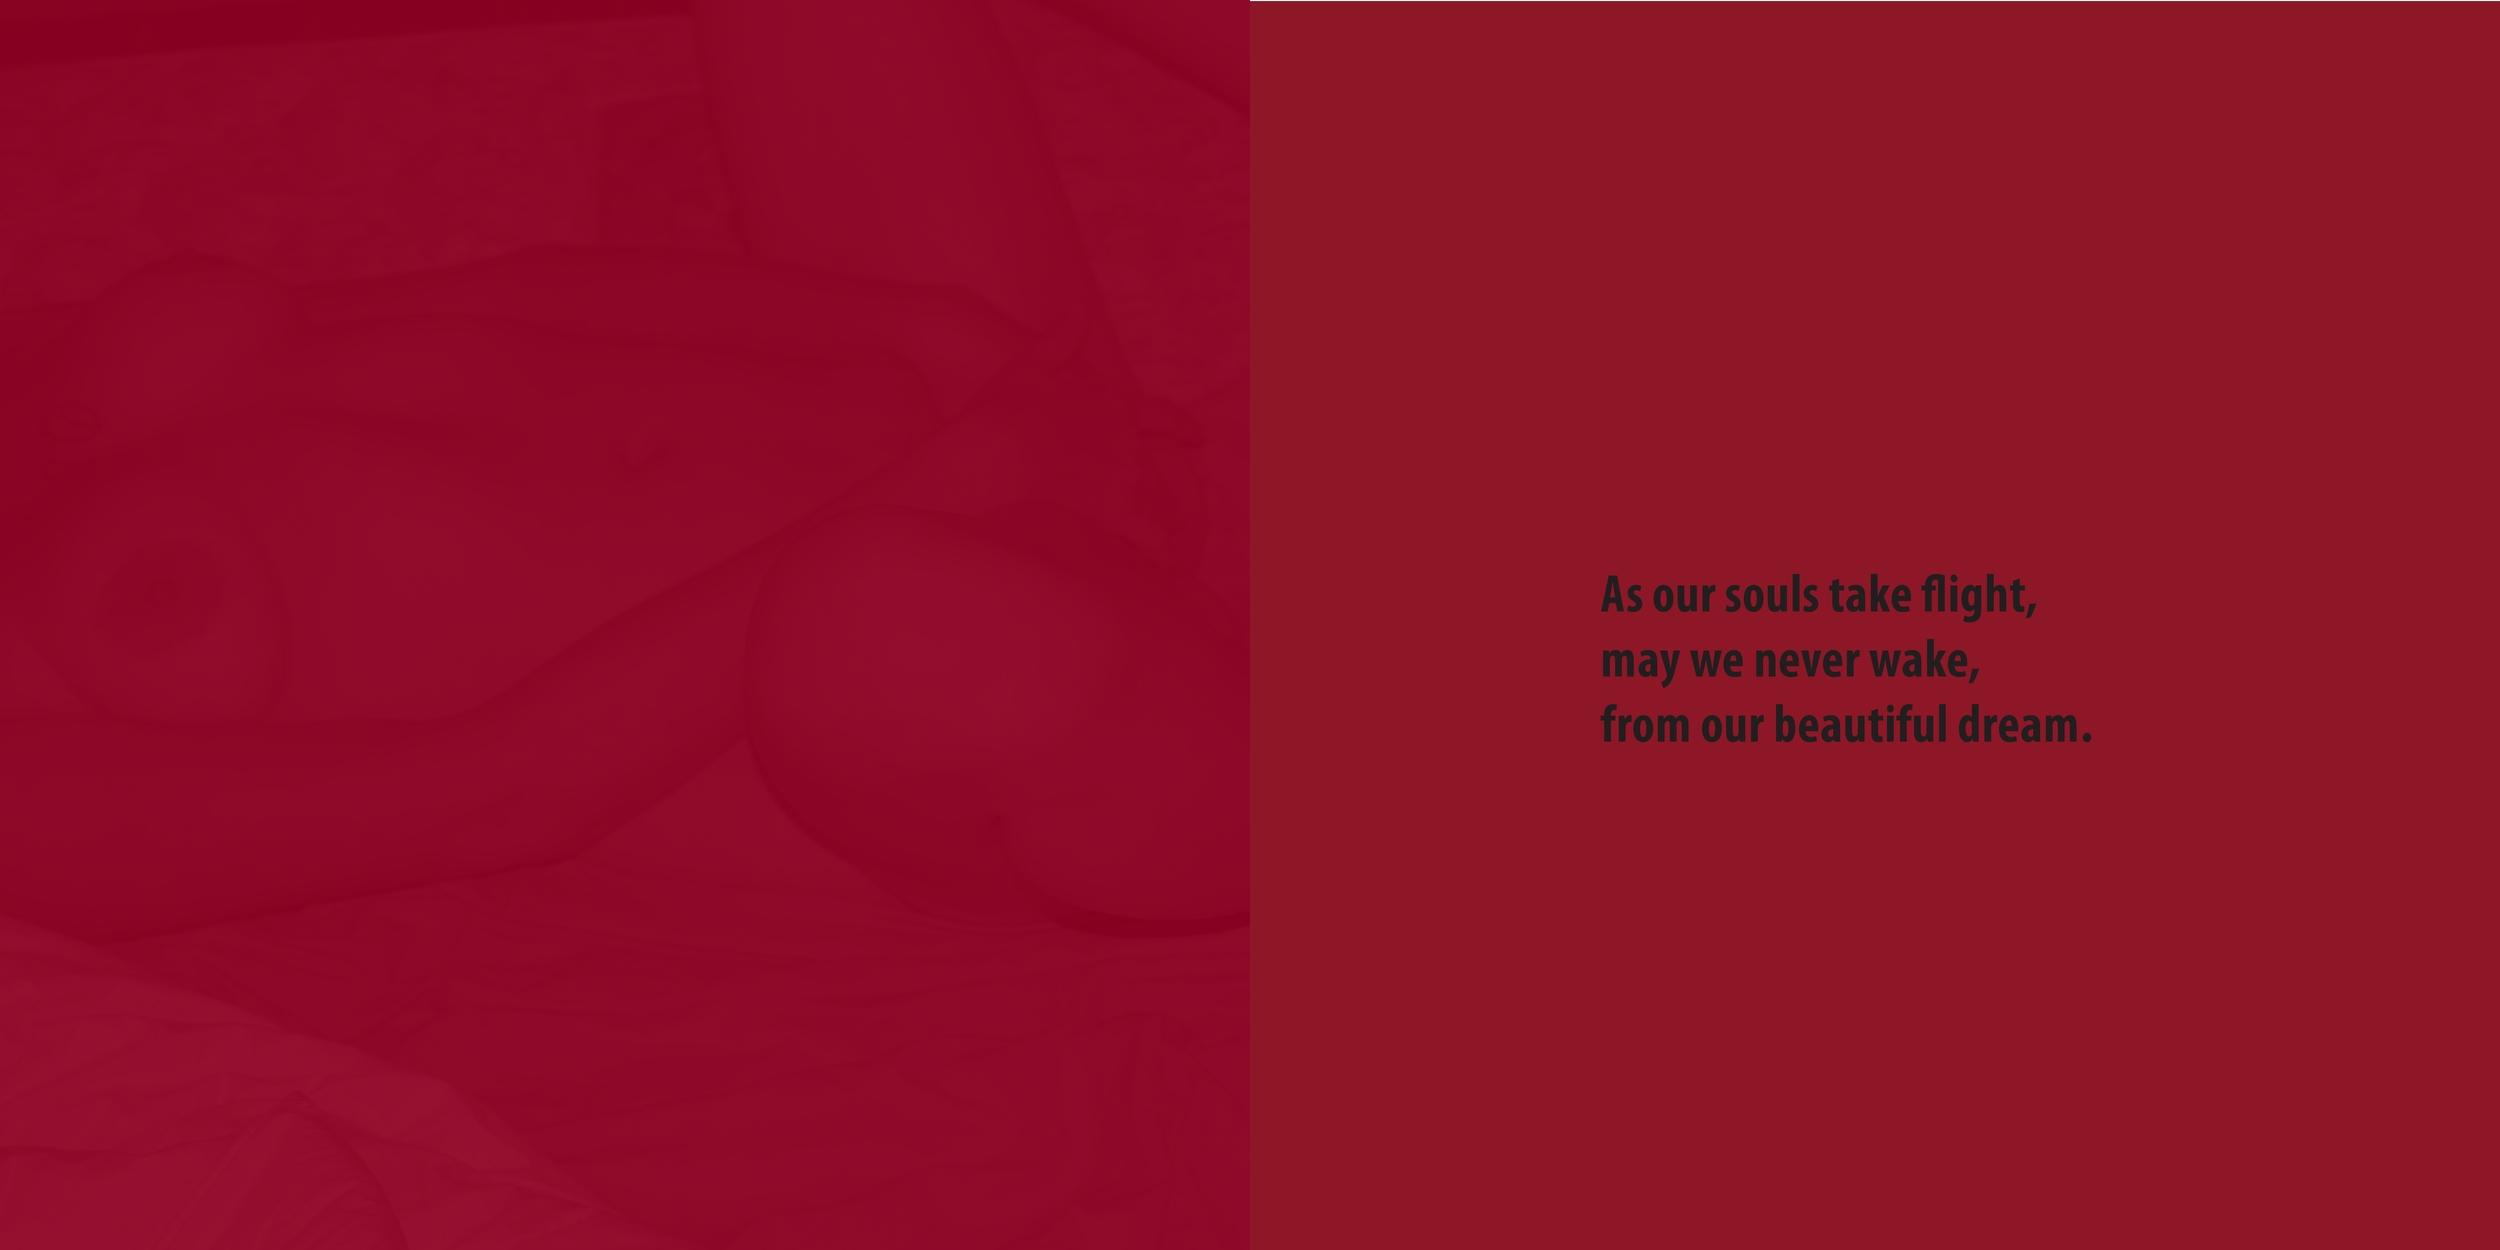 page0012.jpg